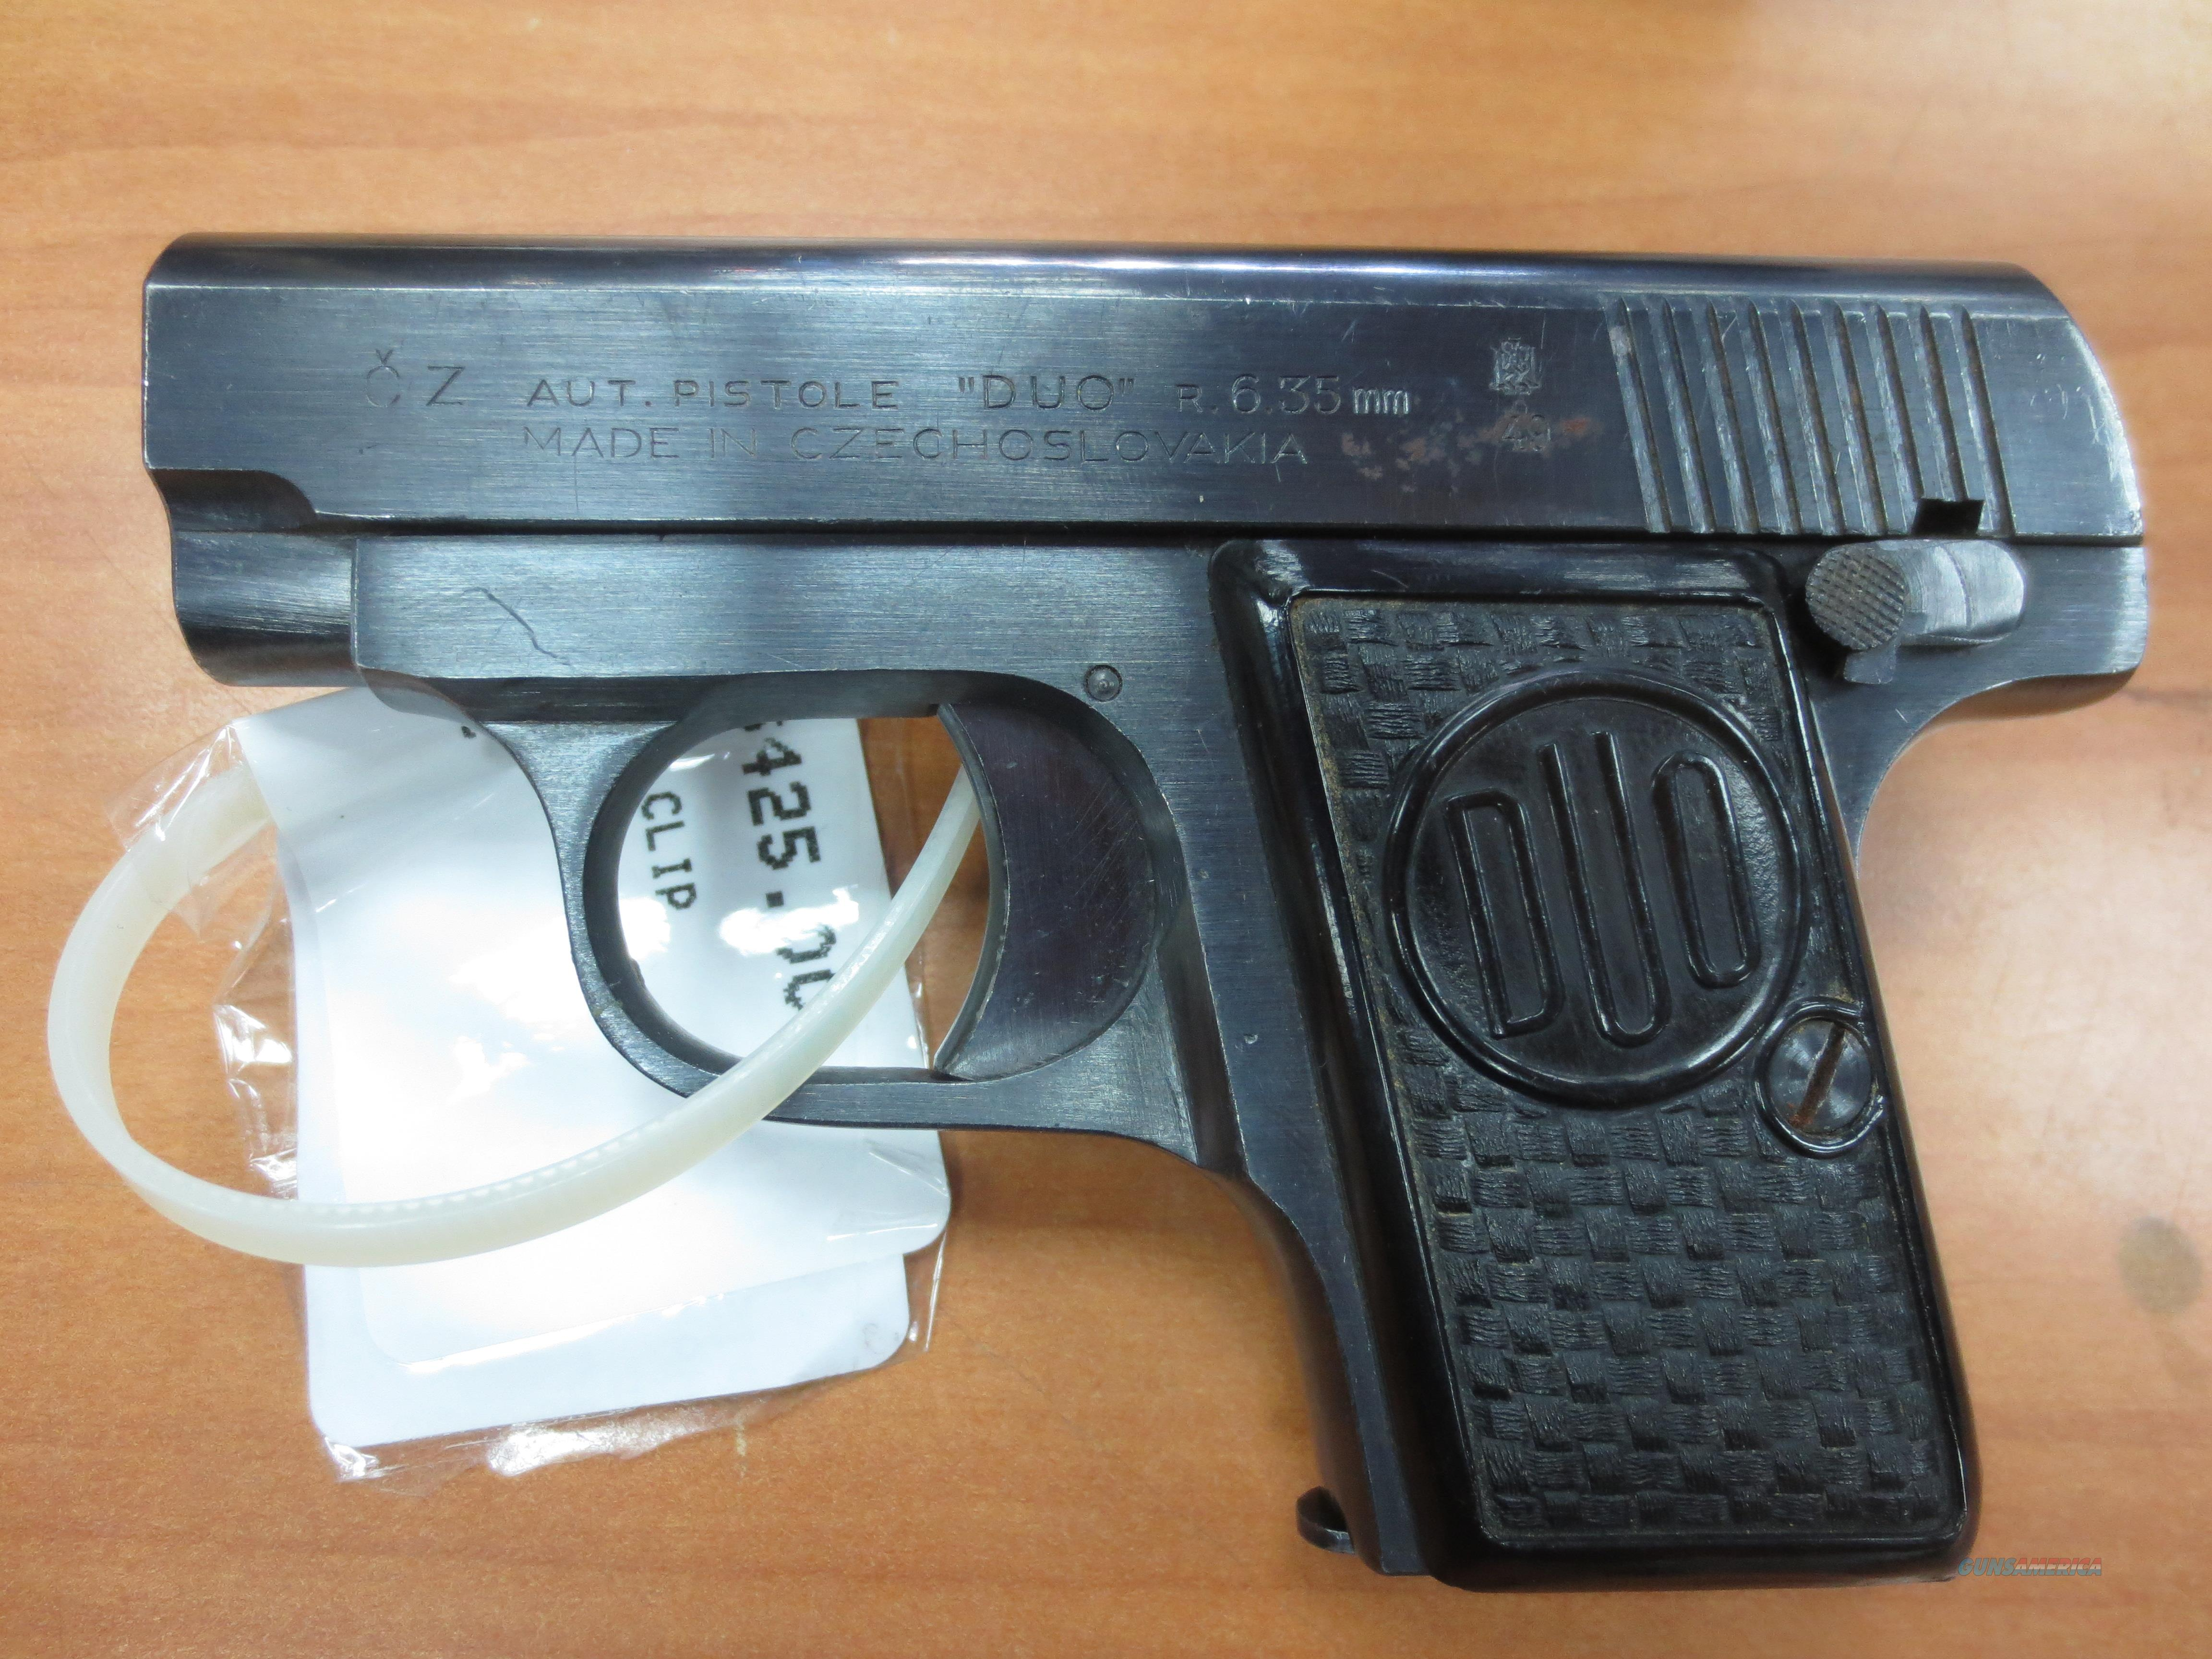 "CZ ""DUO"" pistol 6.35mm (25 acp) made 1949   Guns > Pistols > CZ Pistols"